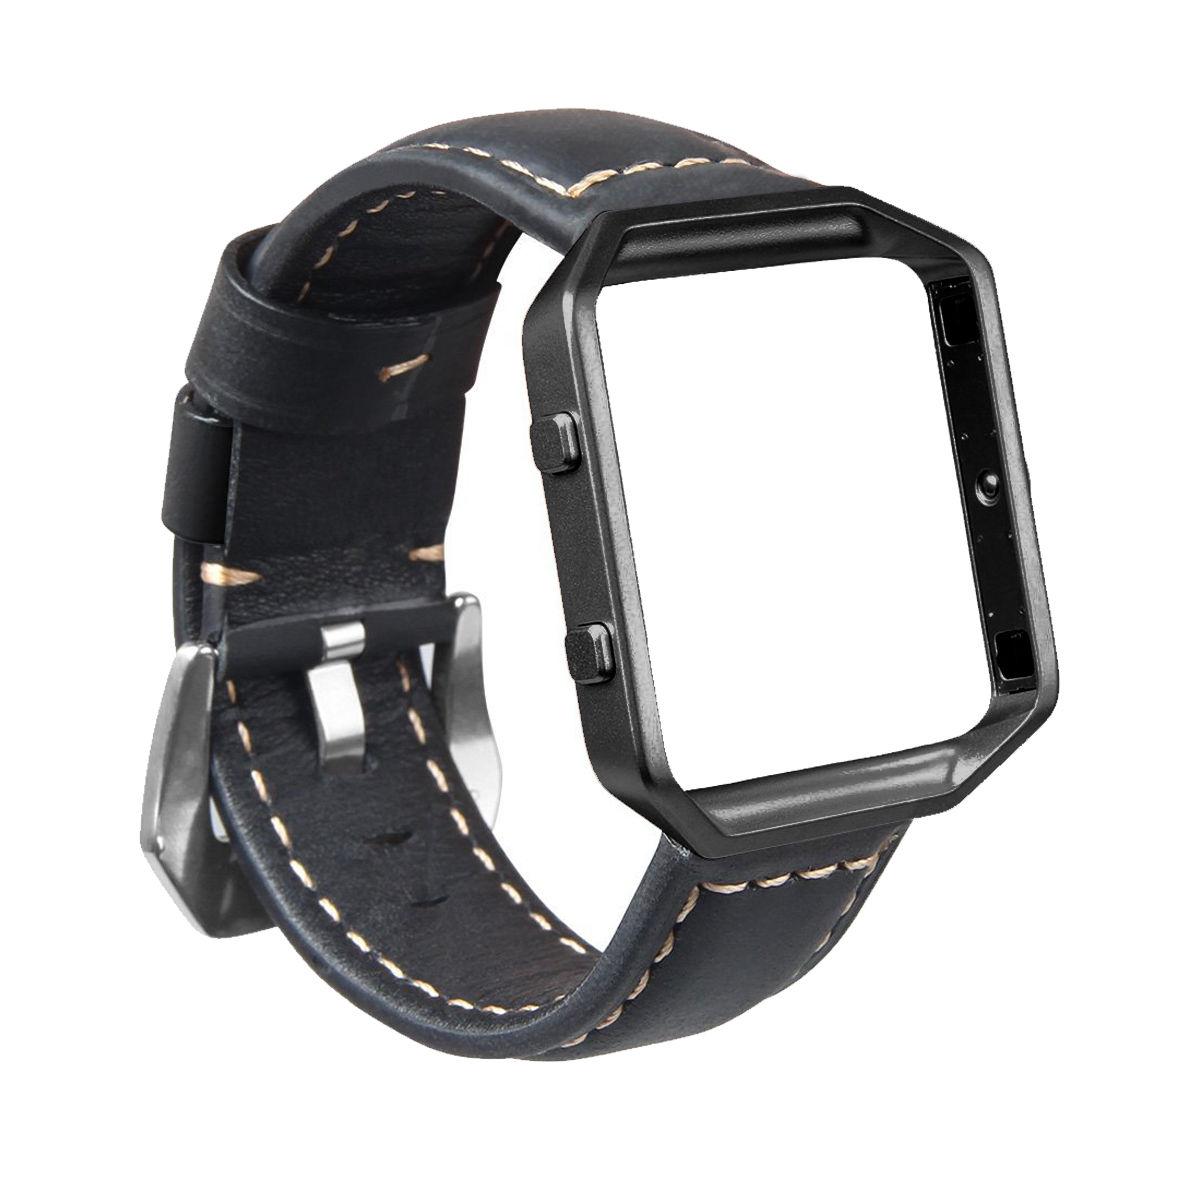 Fitbit Blaze Watch Band, Mignova Resto Genuine Leather Replacement Wrist band strap